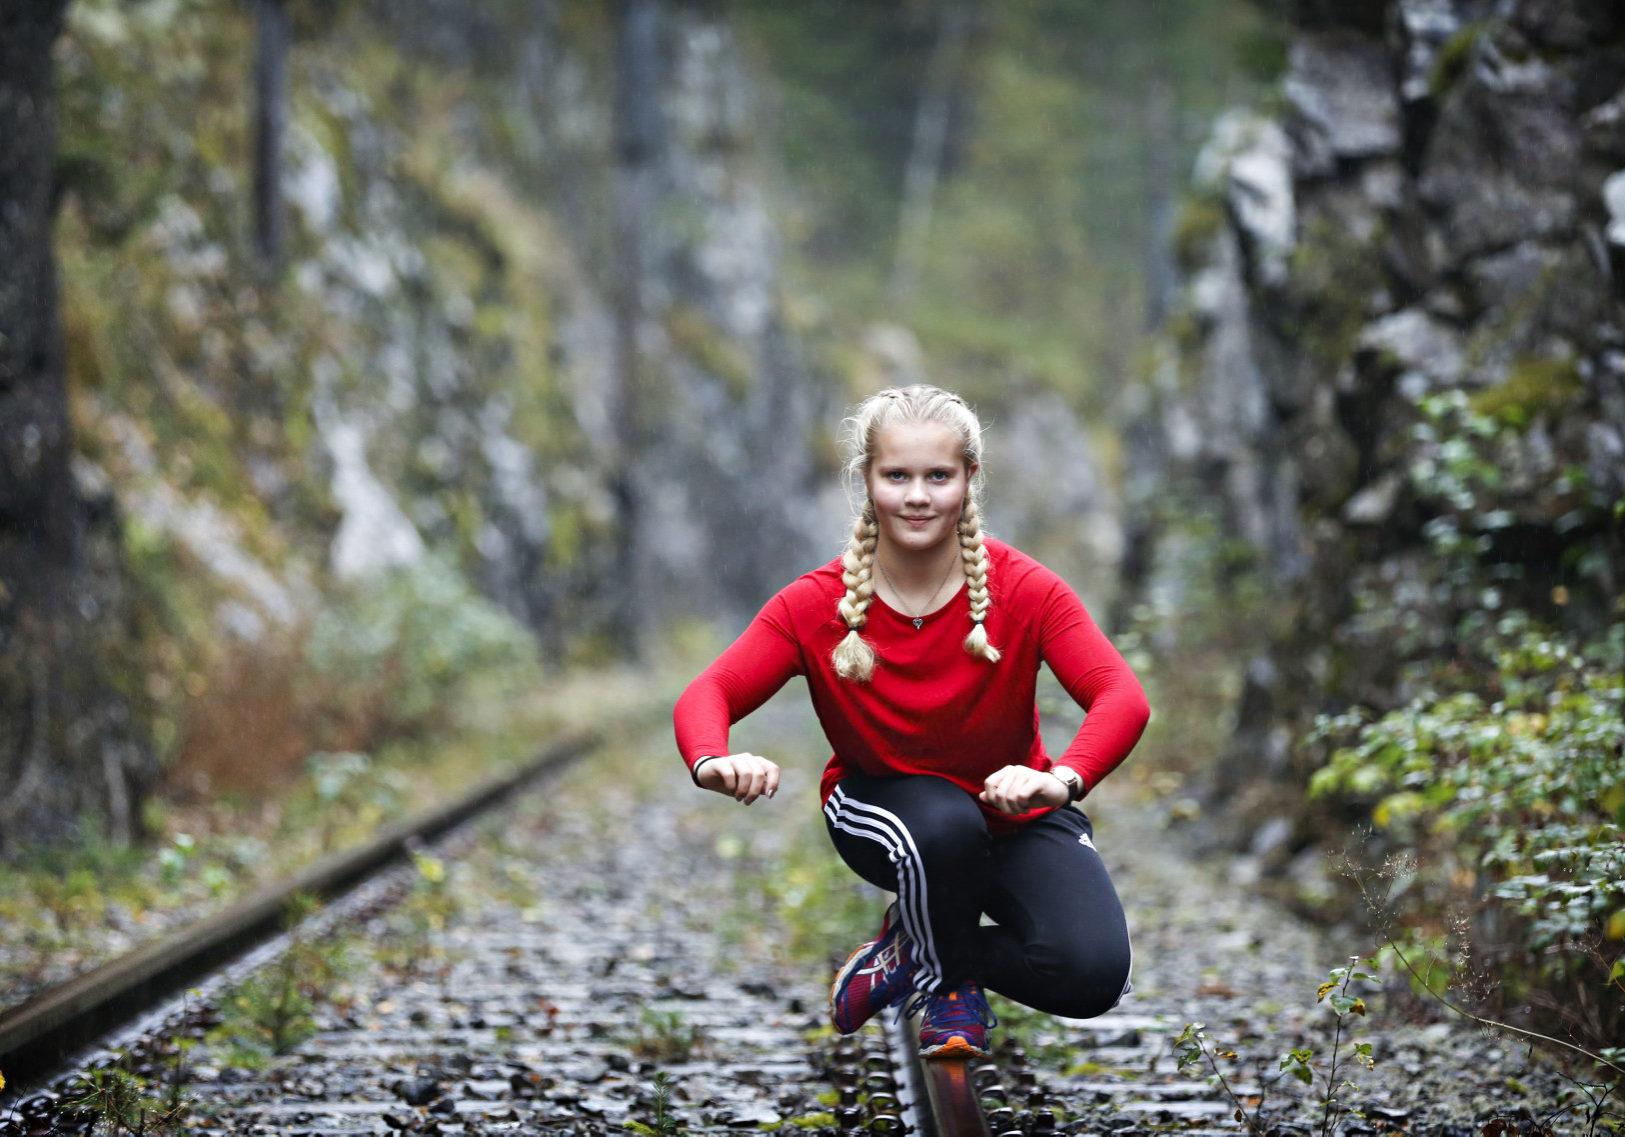 Årlifoss Gransherad Notodden Vilde Westeng - på toppen blant norske hallingdansere. Foto: Dan P. Neegaard